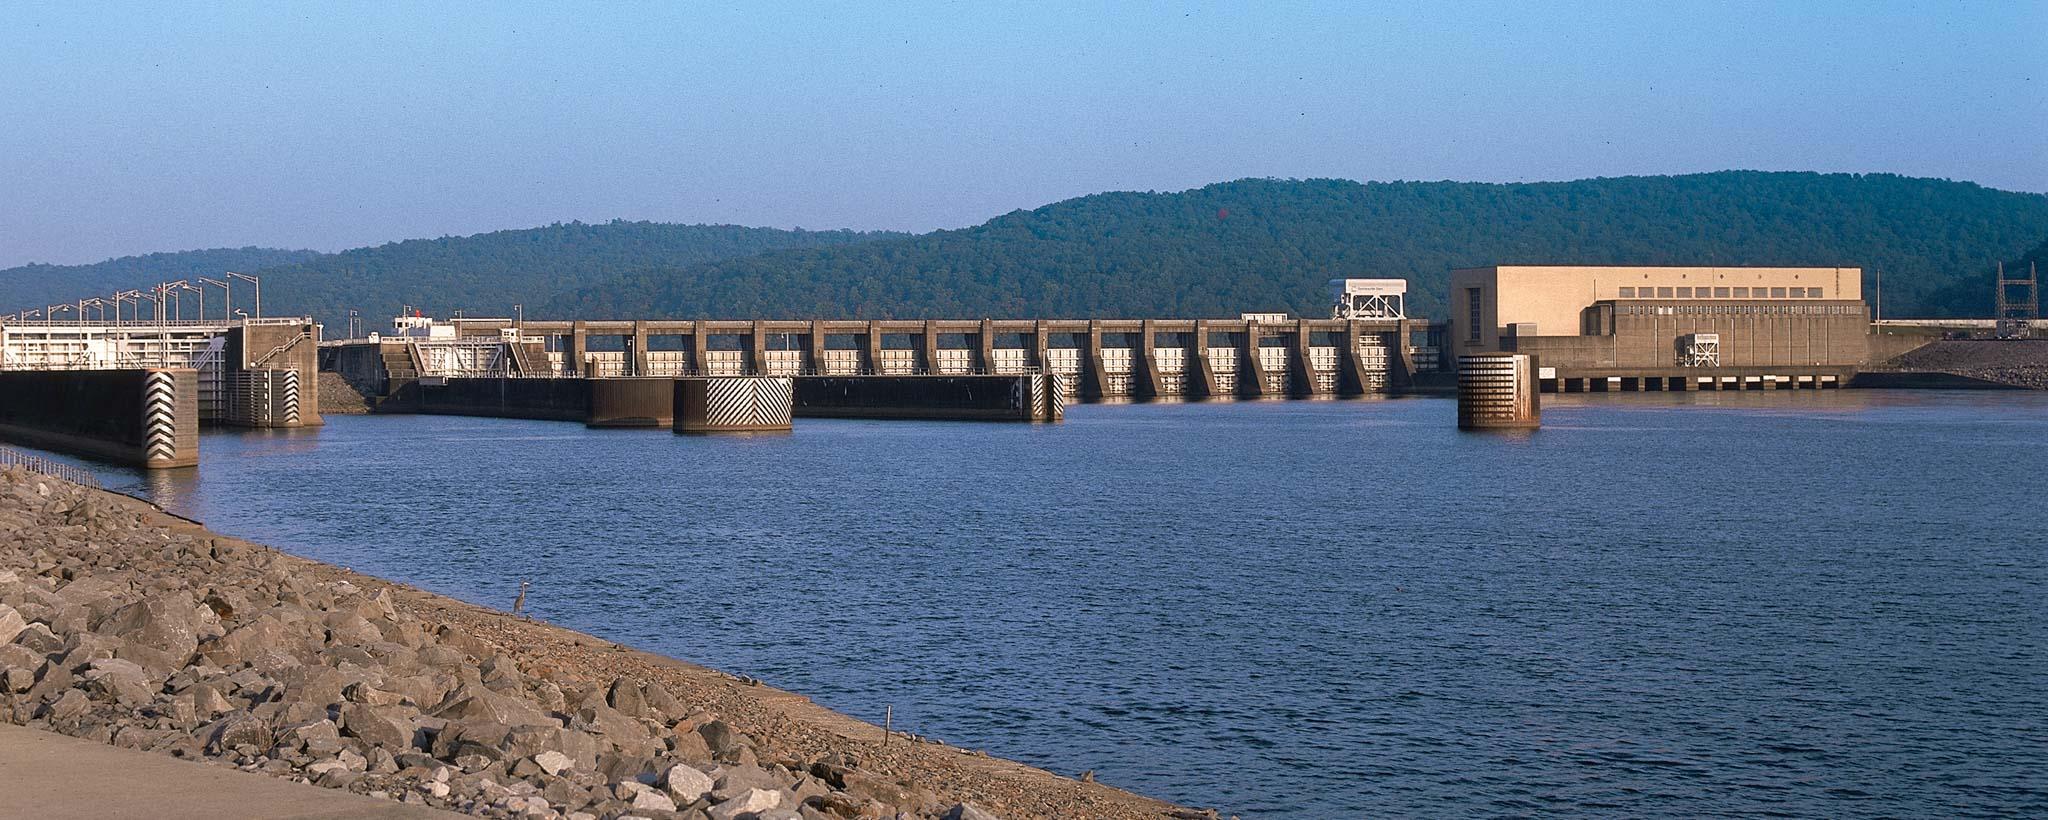 Guntersville Reservoir